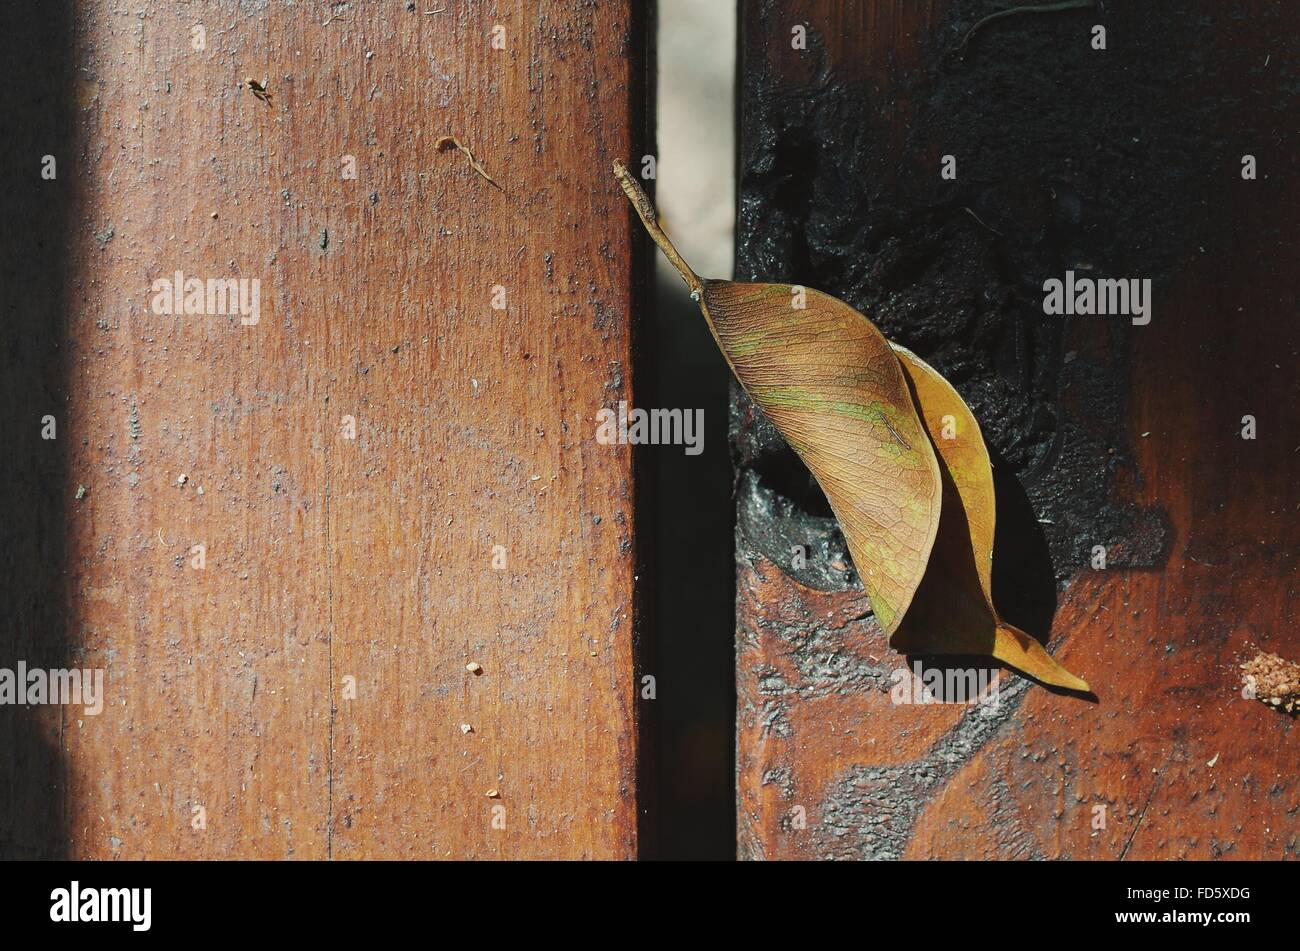 Primer plano de hoja seca sobre la superficie de madera Imagen De Stock